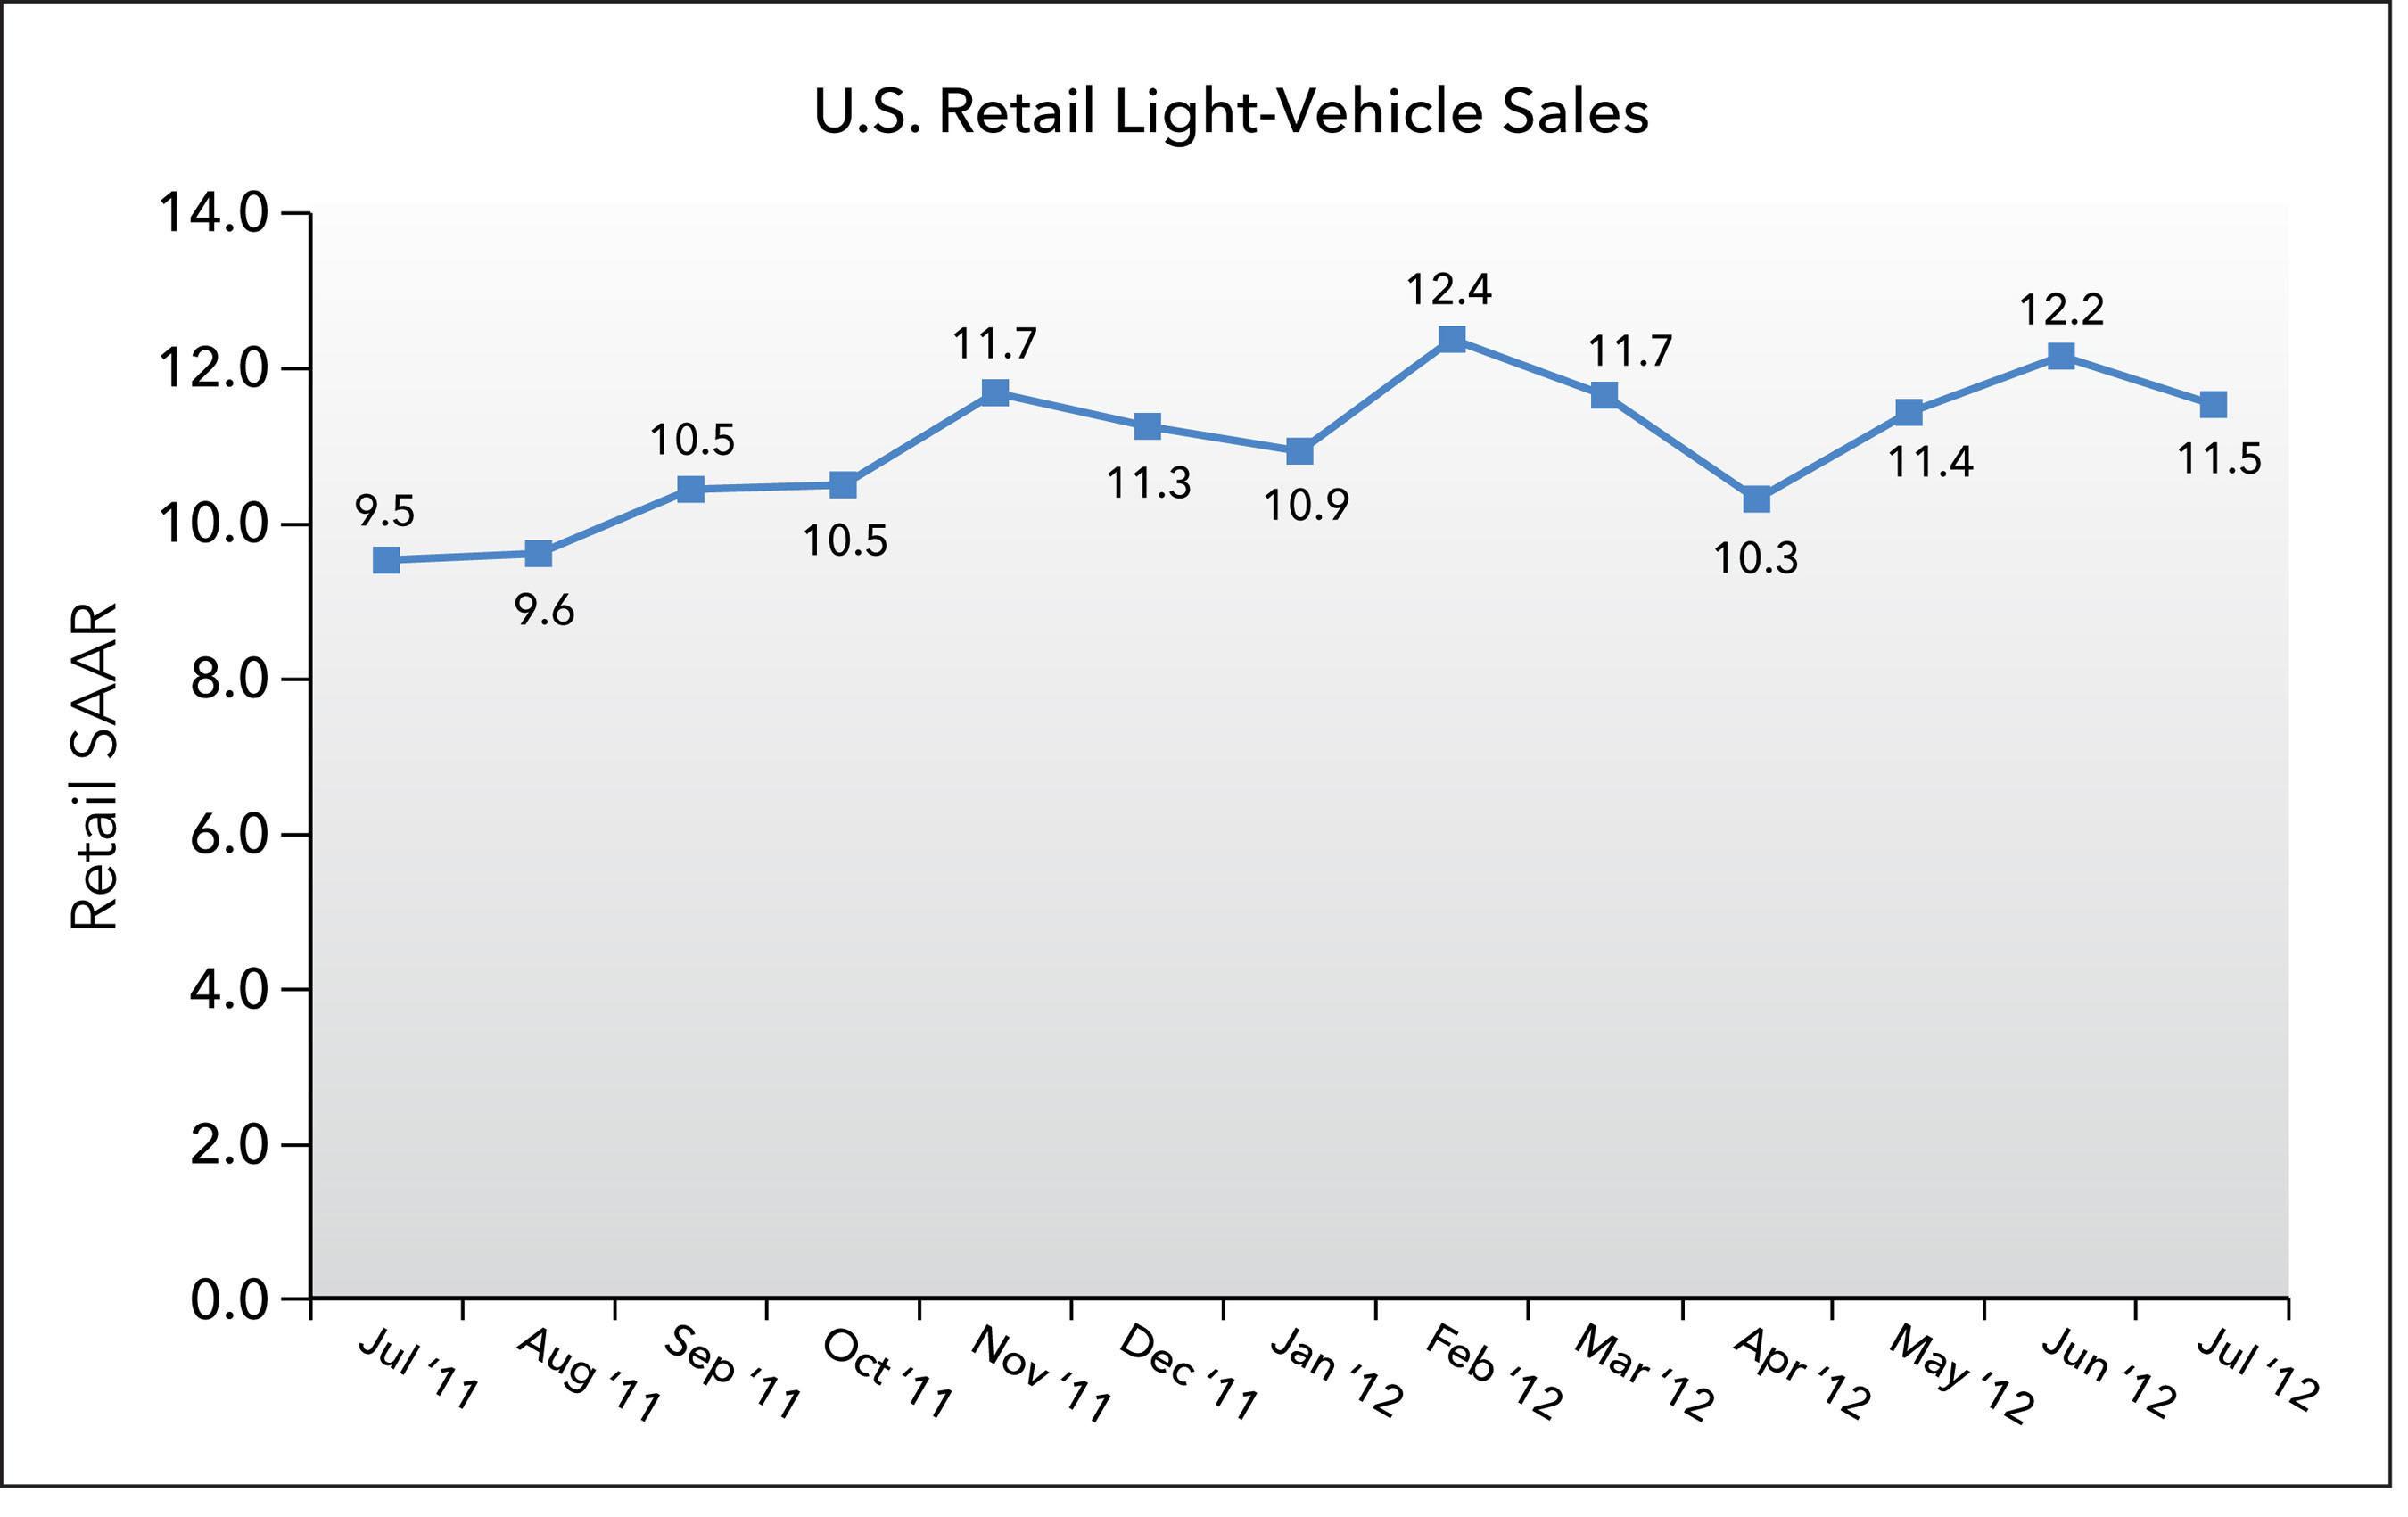 U.S. Retail SAAR July 2011 to July 2012 (in millions of units).  (PRNewsFoto/J.D. Power and Associates)